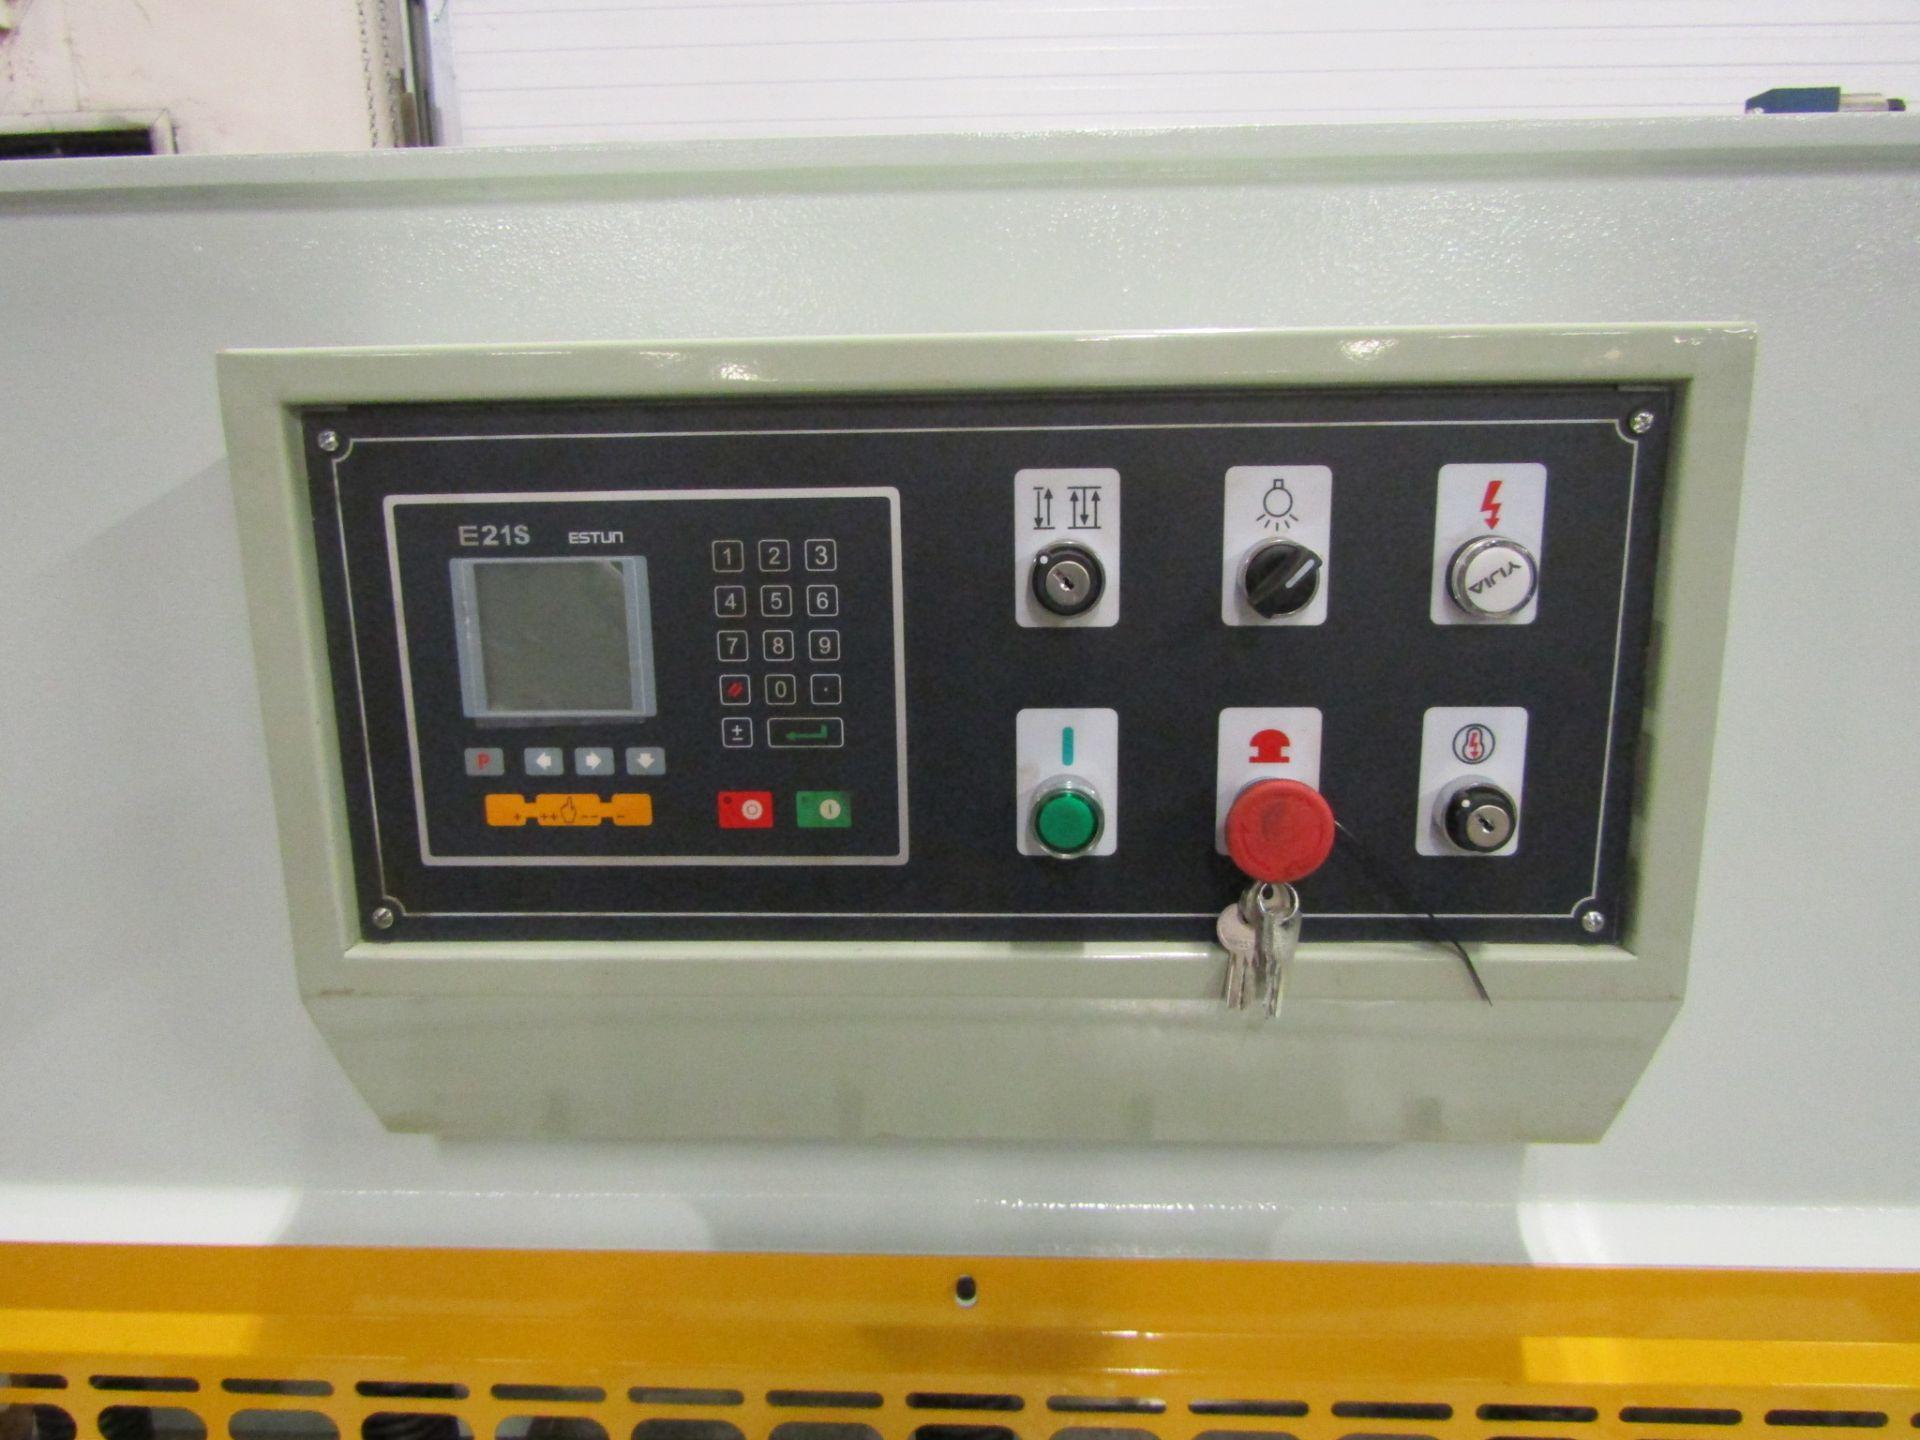 "Bernardo Hydraulic Shear 3/16"" max capacity 98"" width - 480/575V 3 phase MINT UNUSED UNIT complete - Image 2 of 6"